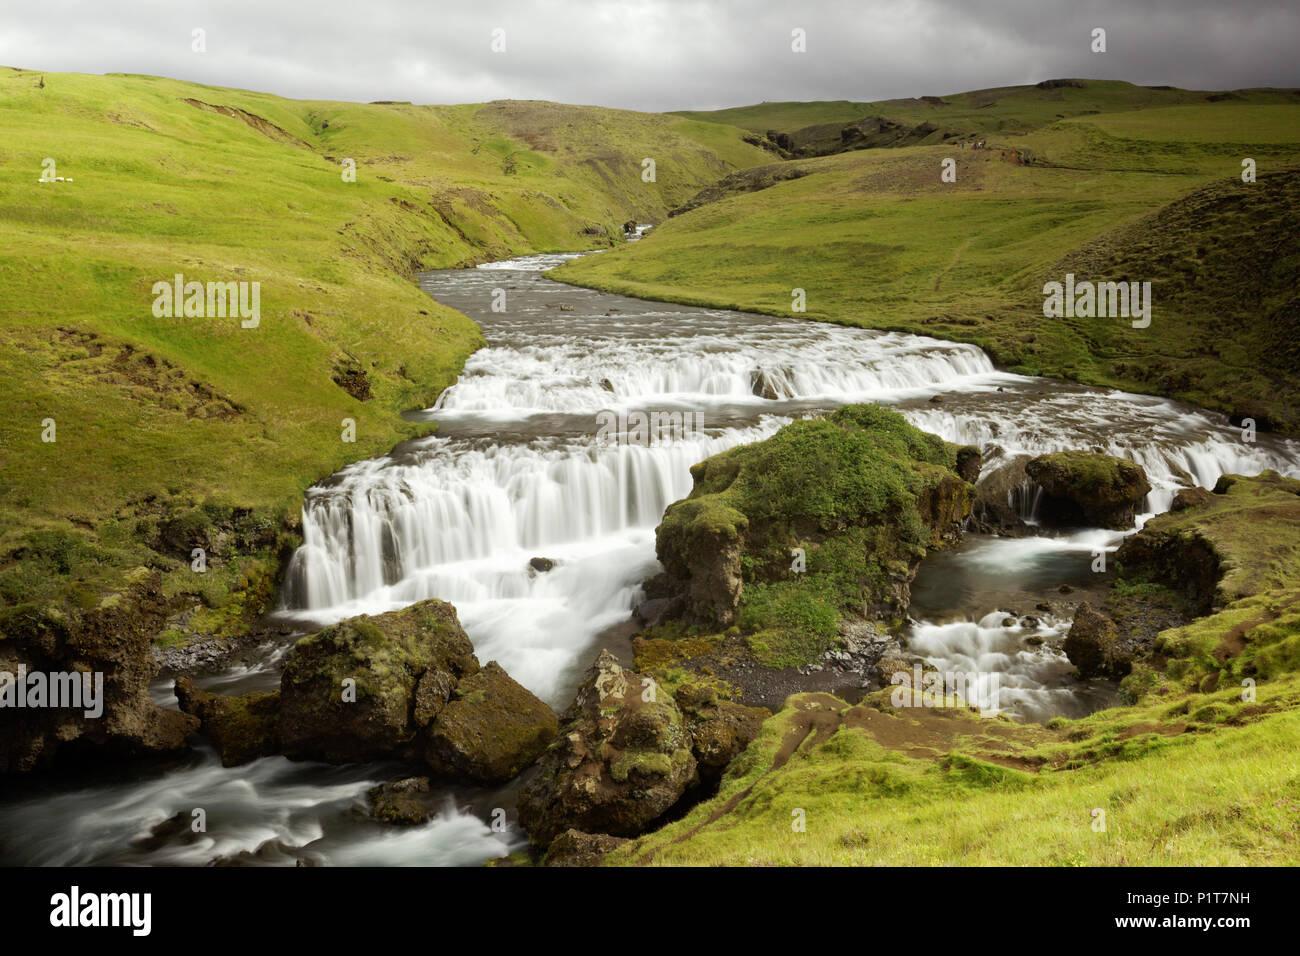 Skógá River falls over cascade waterfall, Skógar, South Region, Iceland - Stock Image